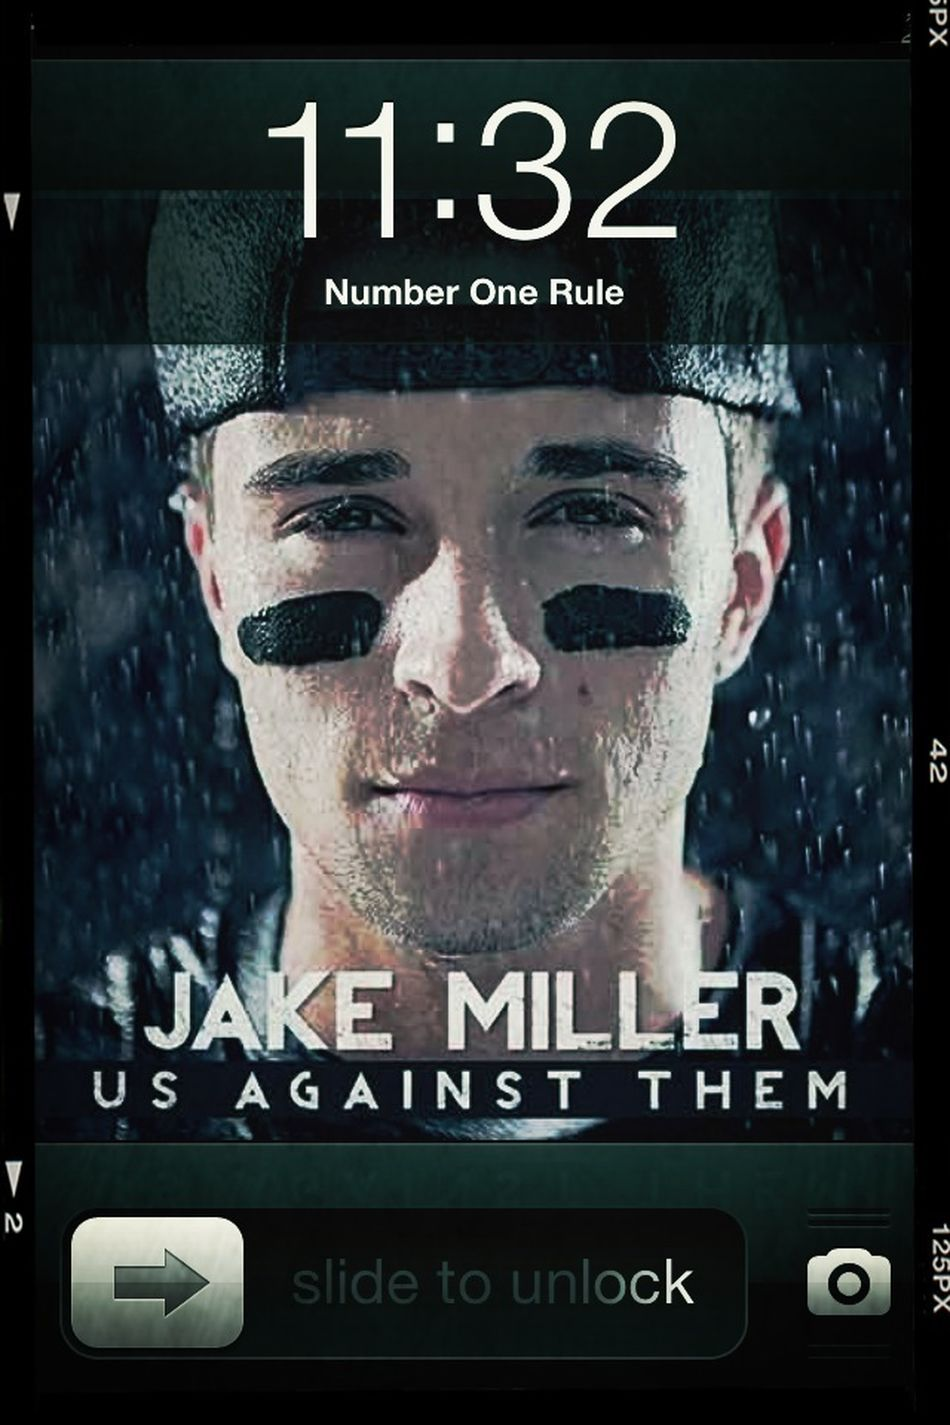 JakeMillerMusic -Us Against Them-?